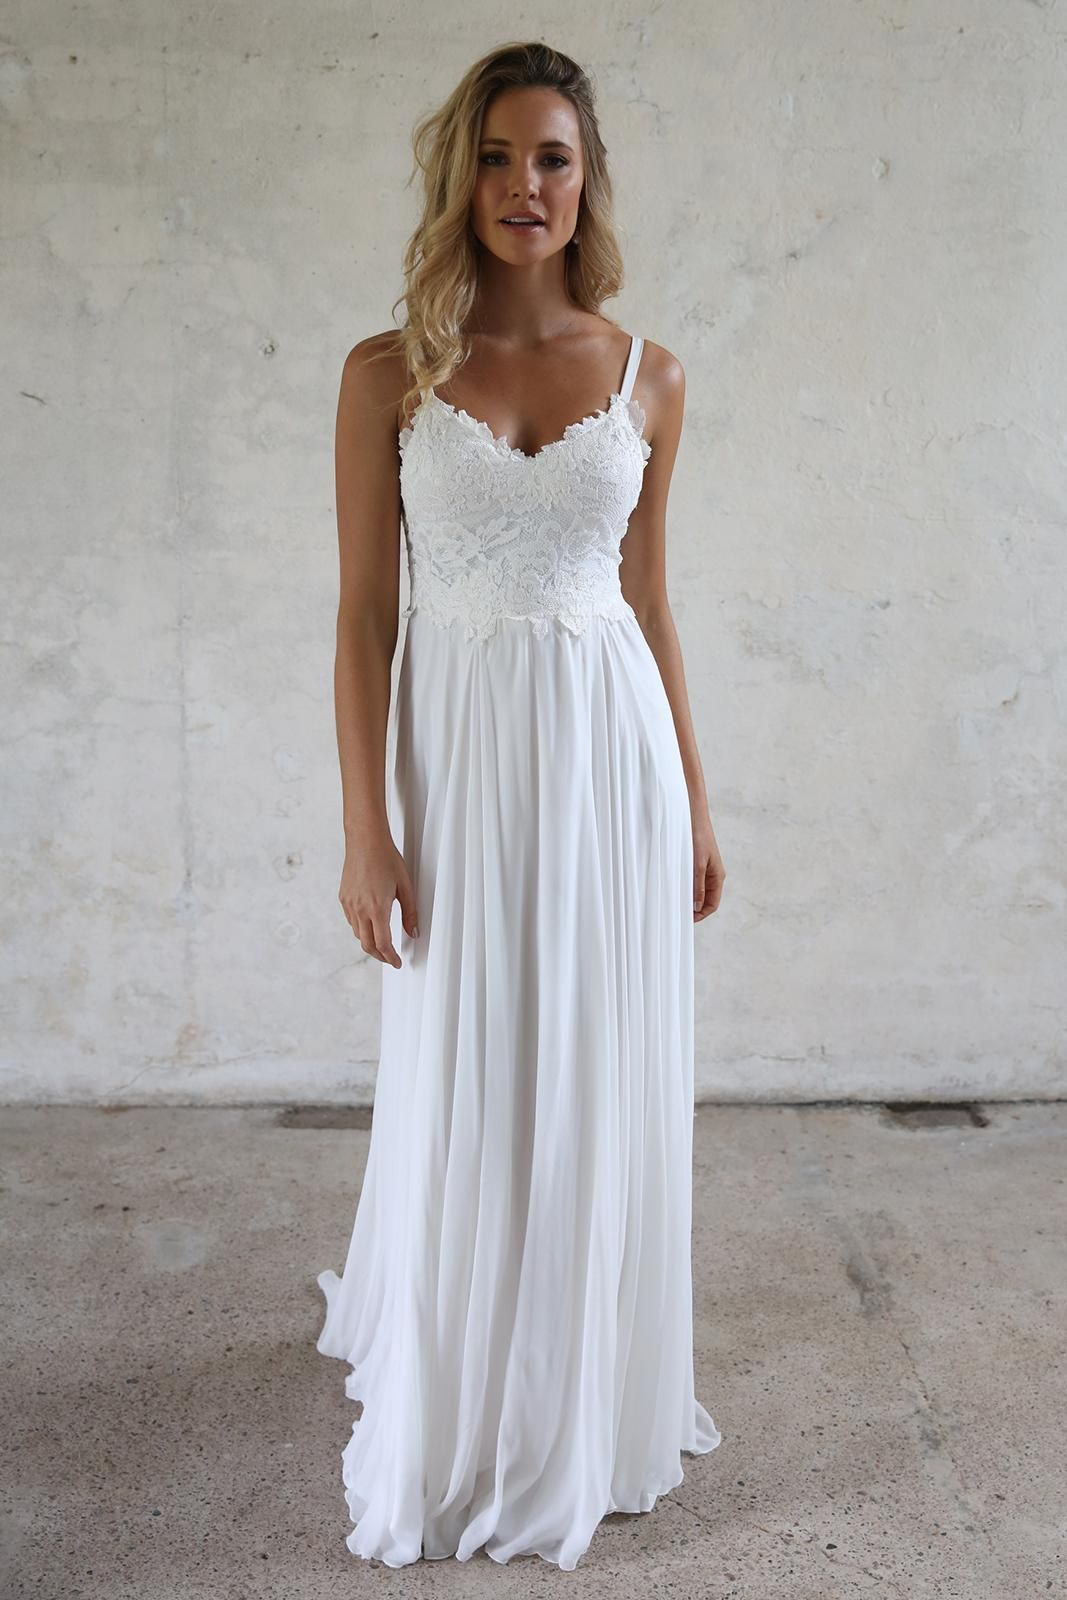 A Line Spaghetti Straps Lace Top Boho Beach Wedding Dresses Lace Beach Wedding Dress Simple Wedding Gowns Beach Wedding Dress Boho [ 1600 x 1067 Pixel ]